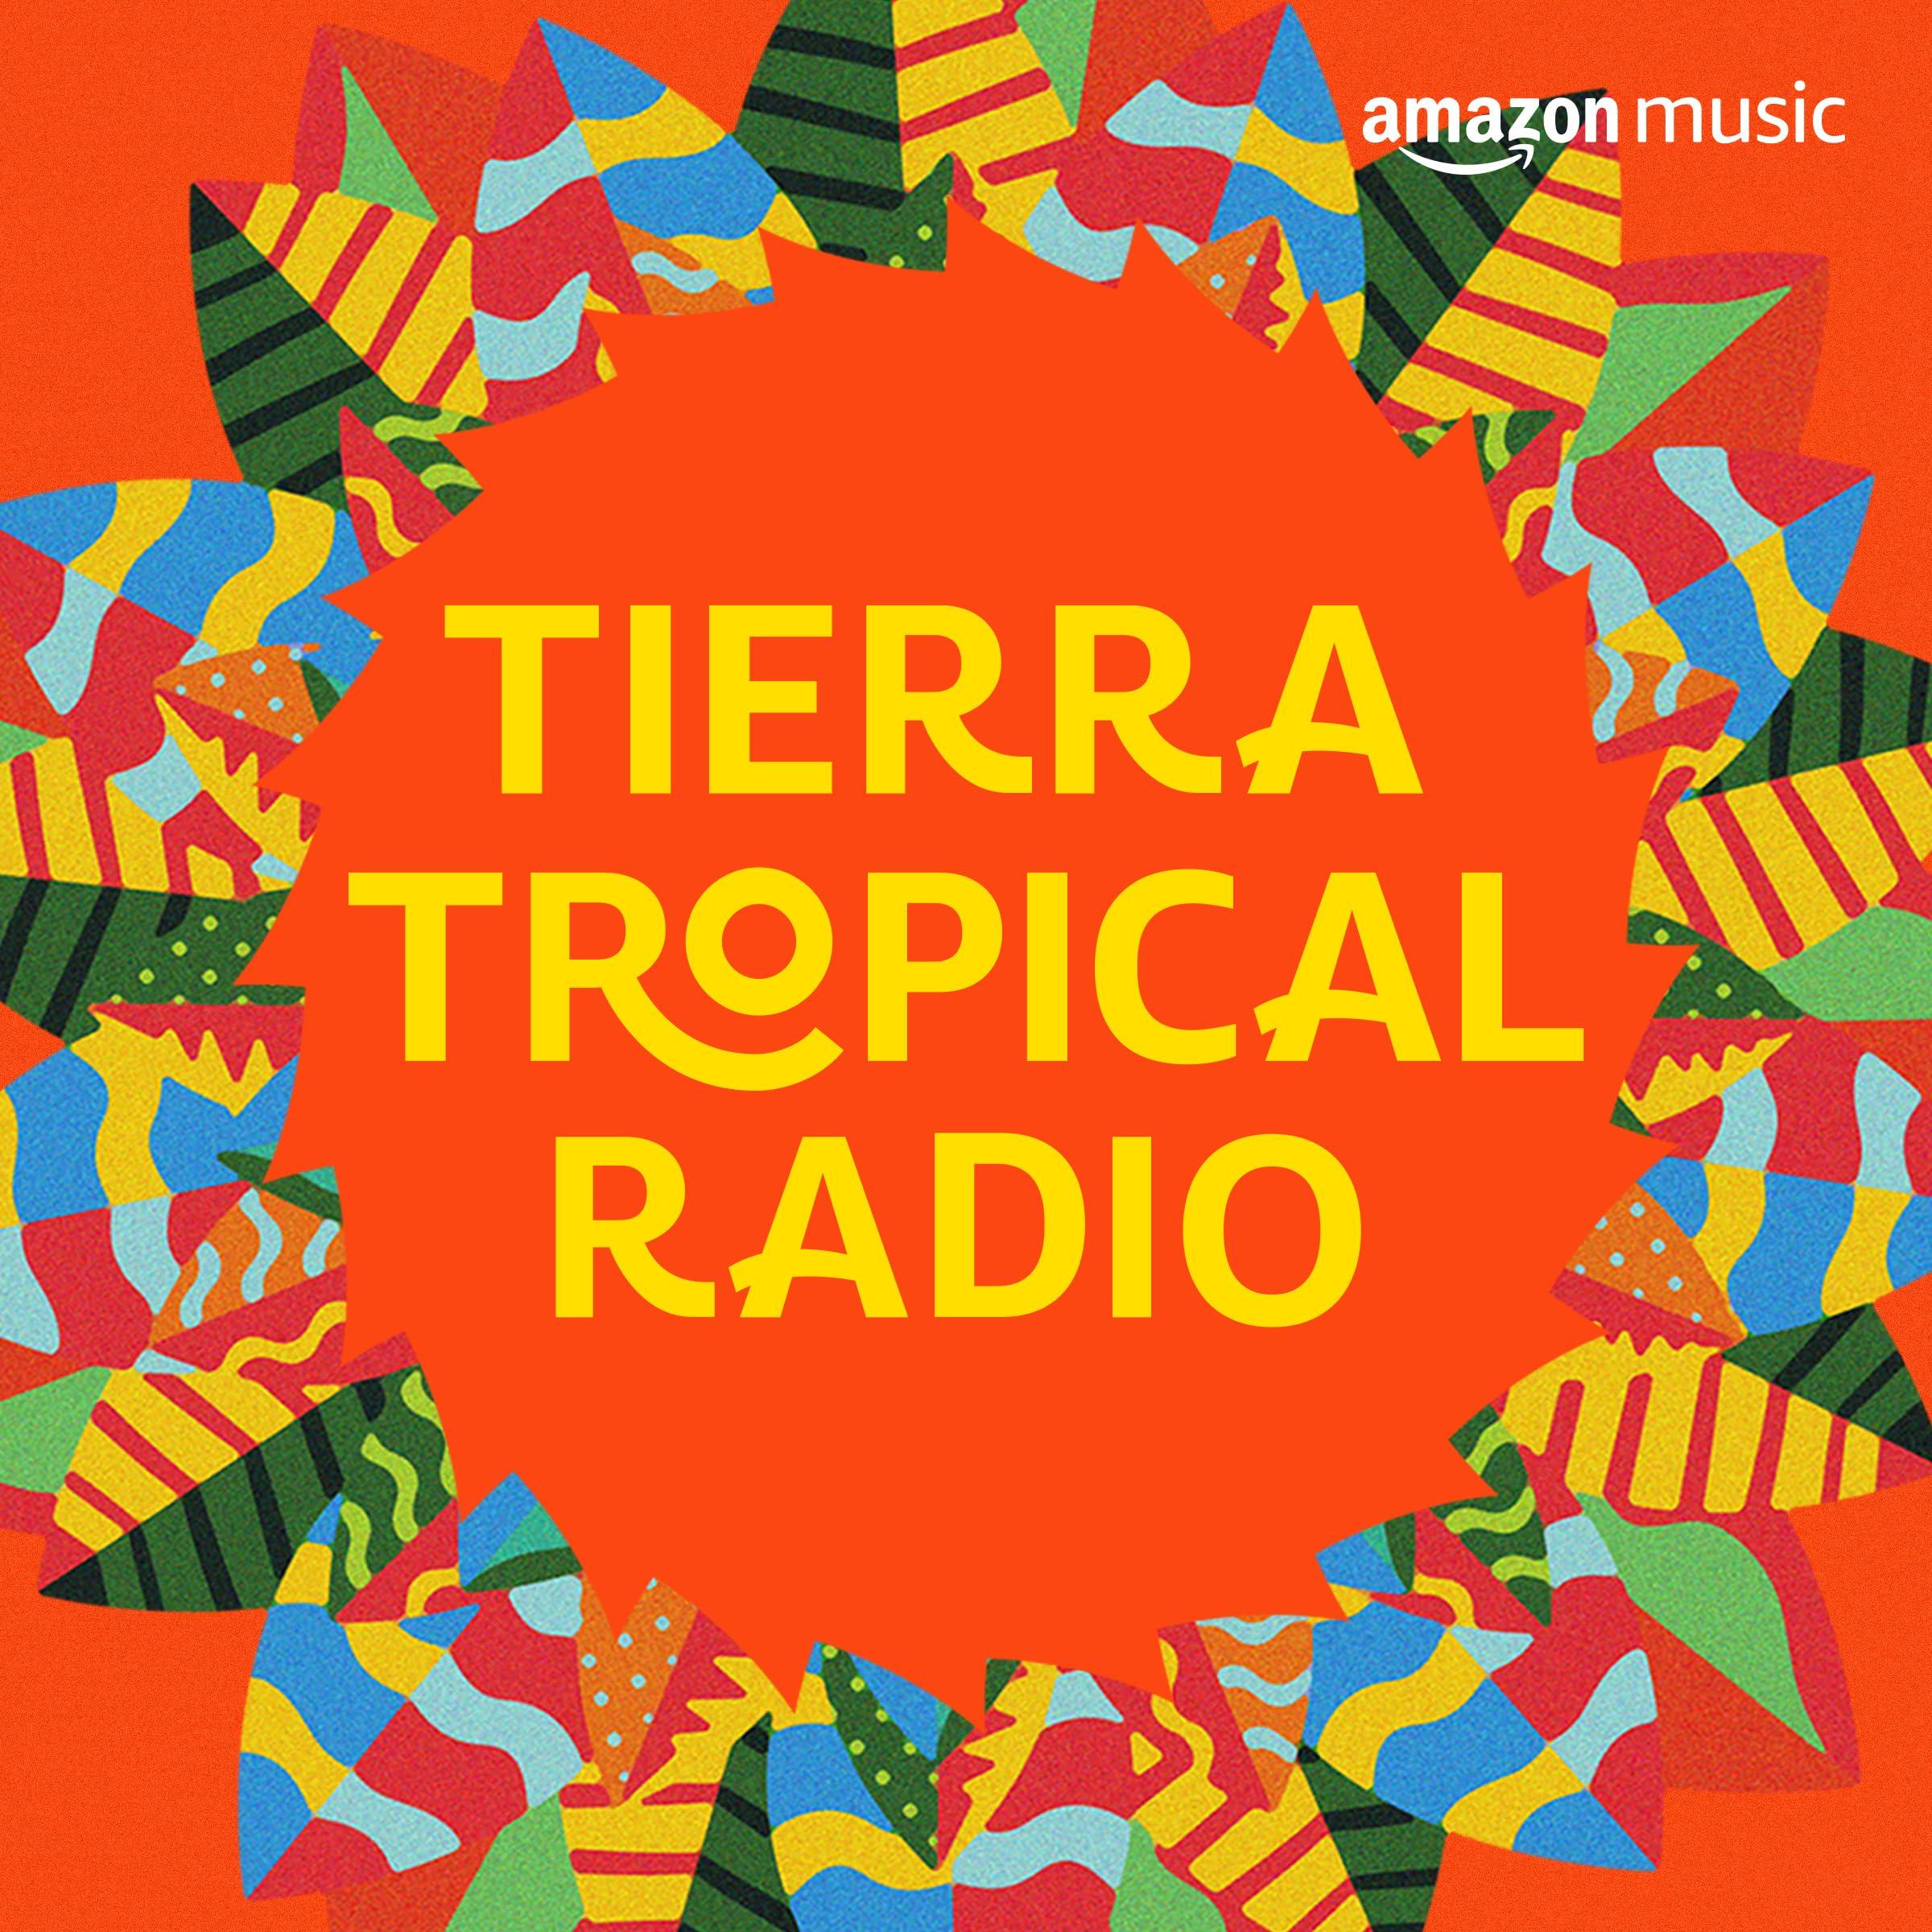 Tierra Tropical Radio